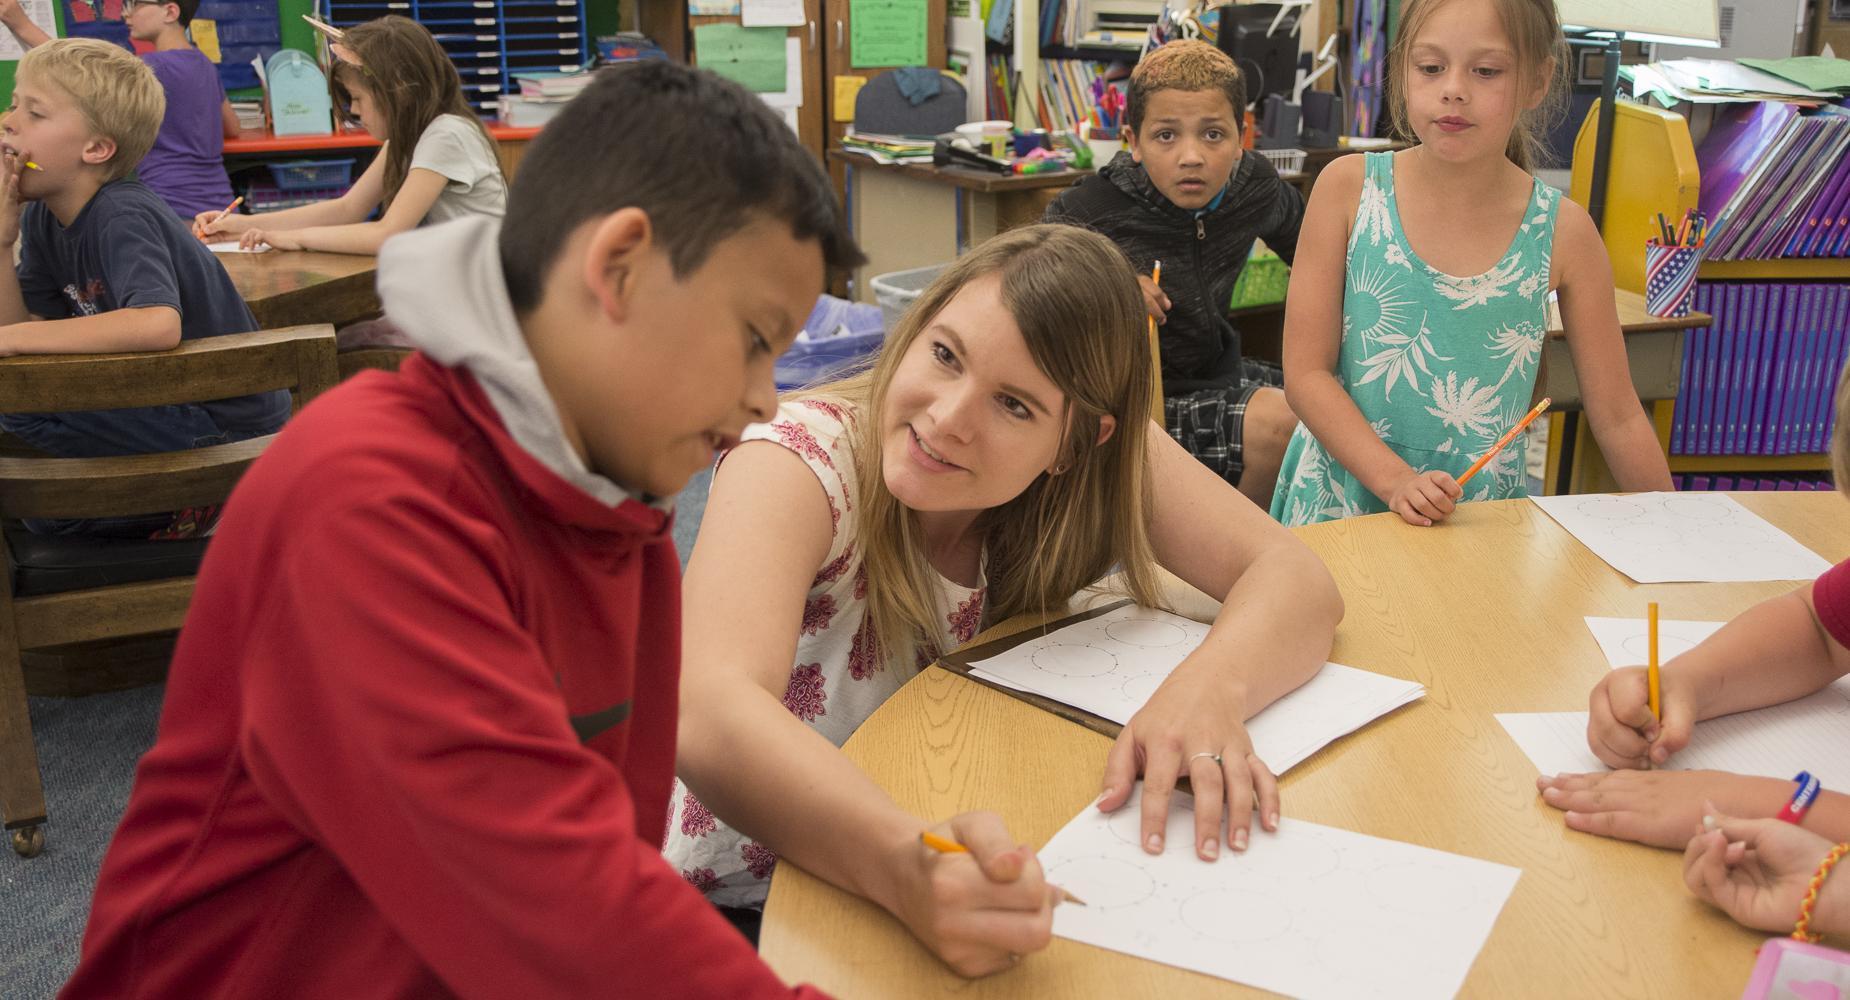 Teacher helps boy in red sweatshirt with worksheet.